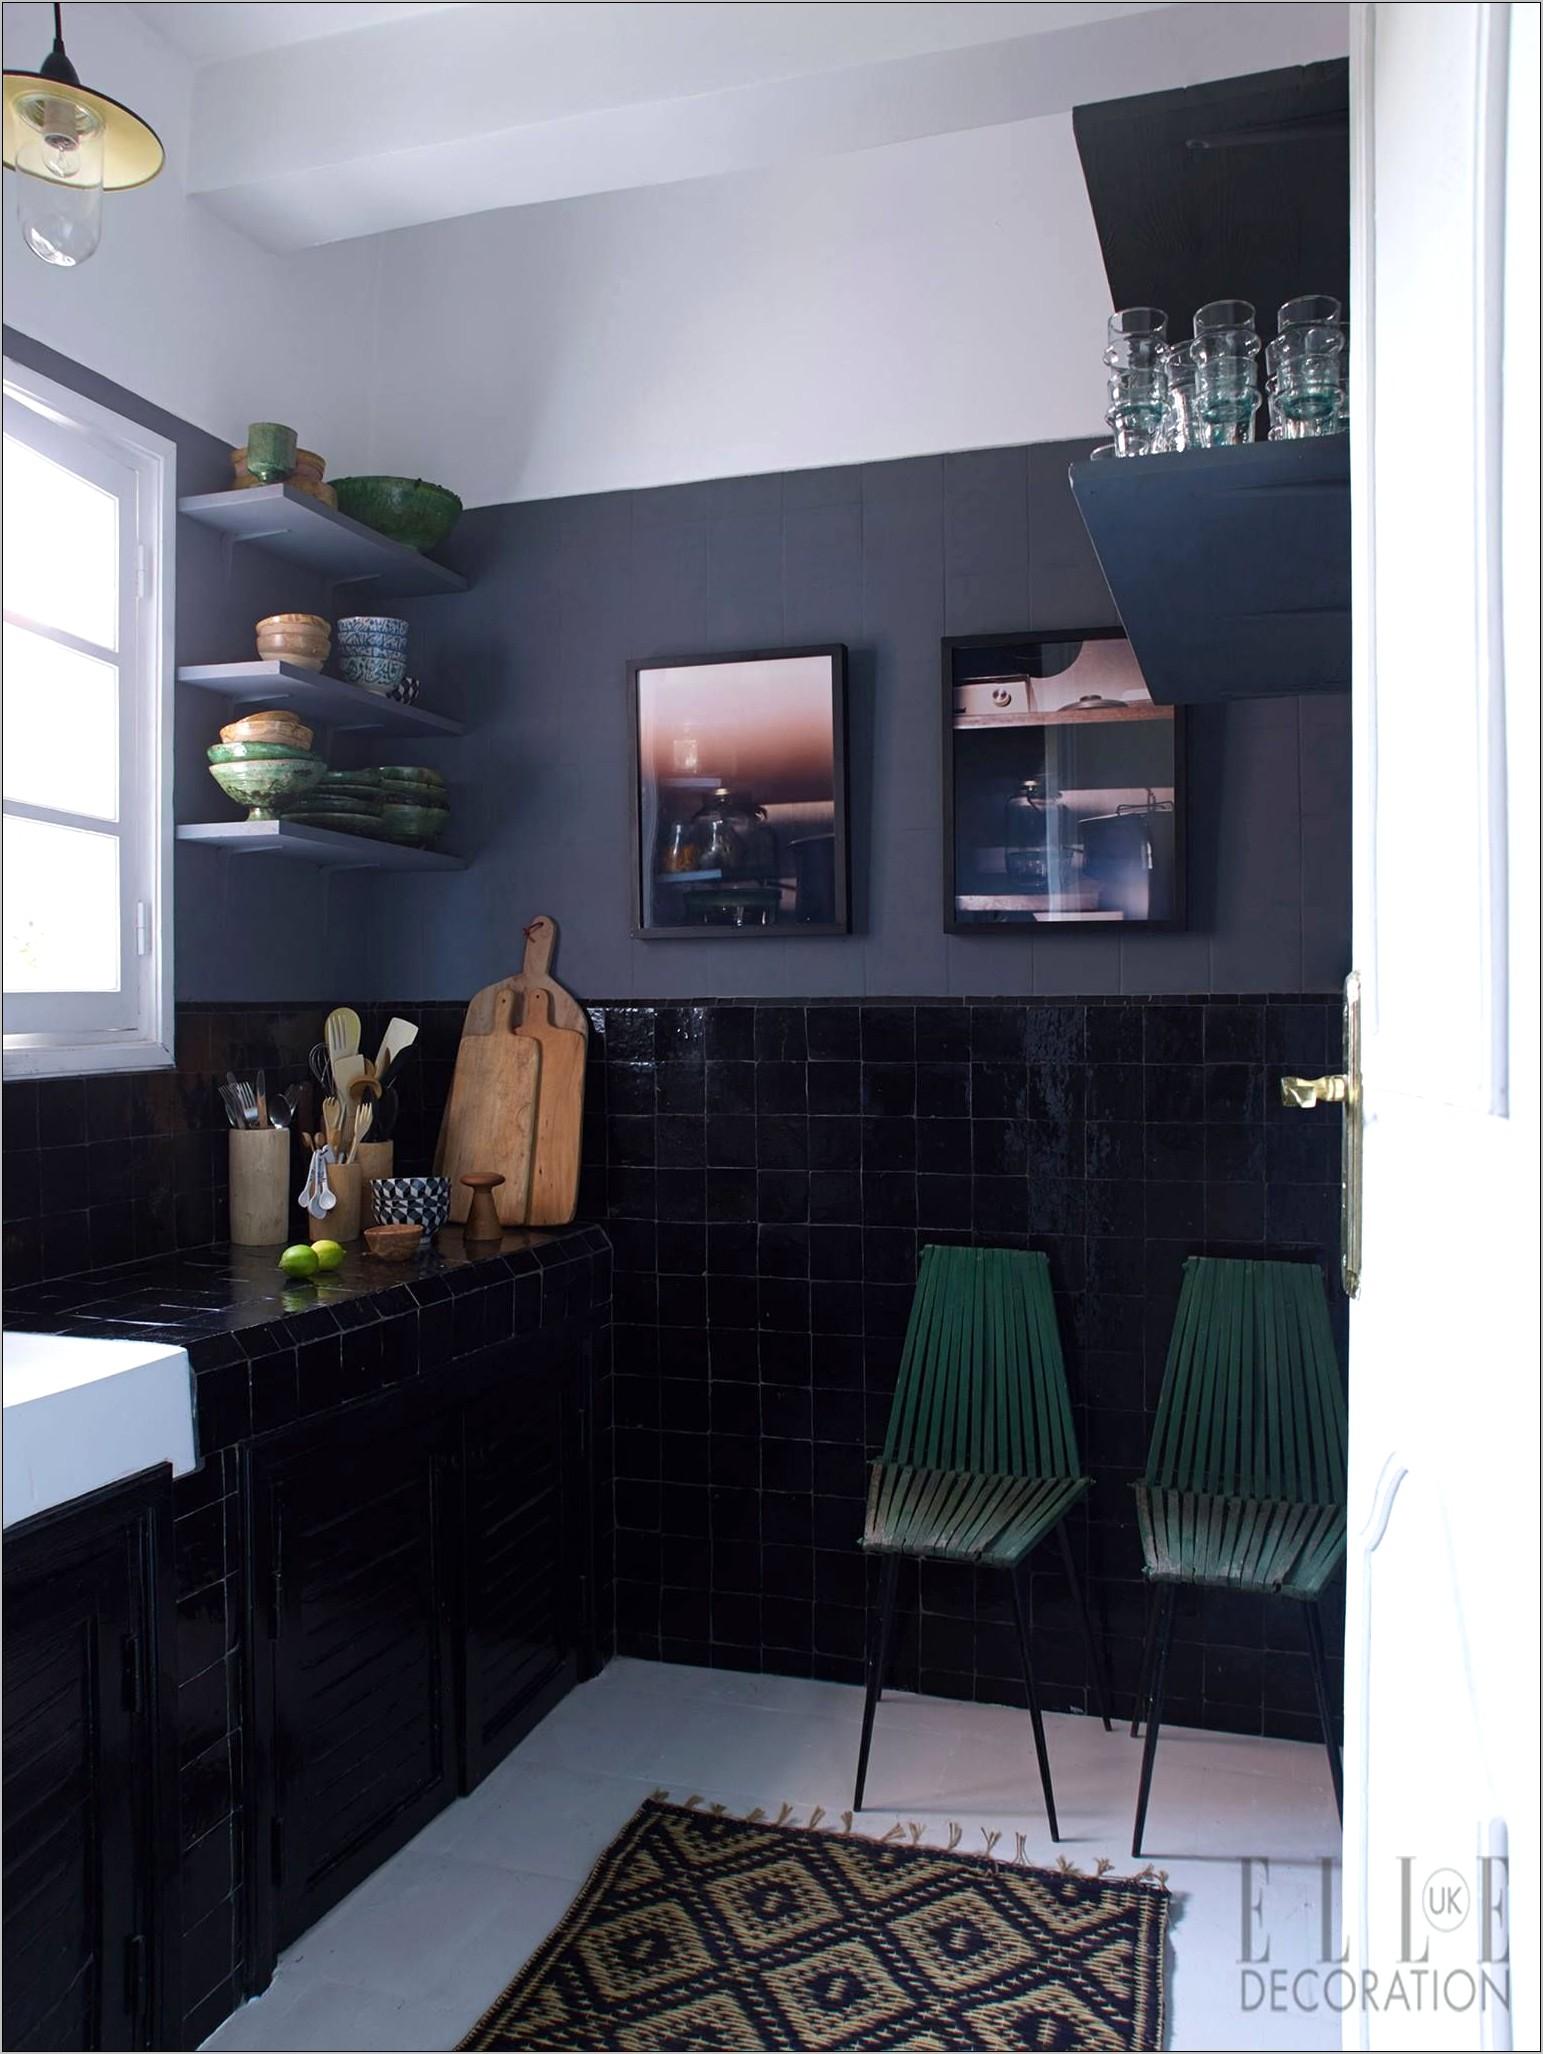 Elle Decor Kitchen Backsplash